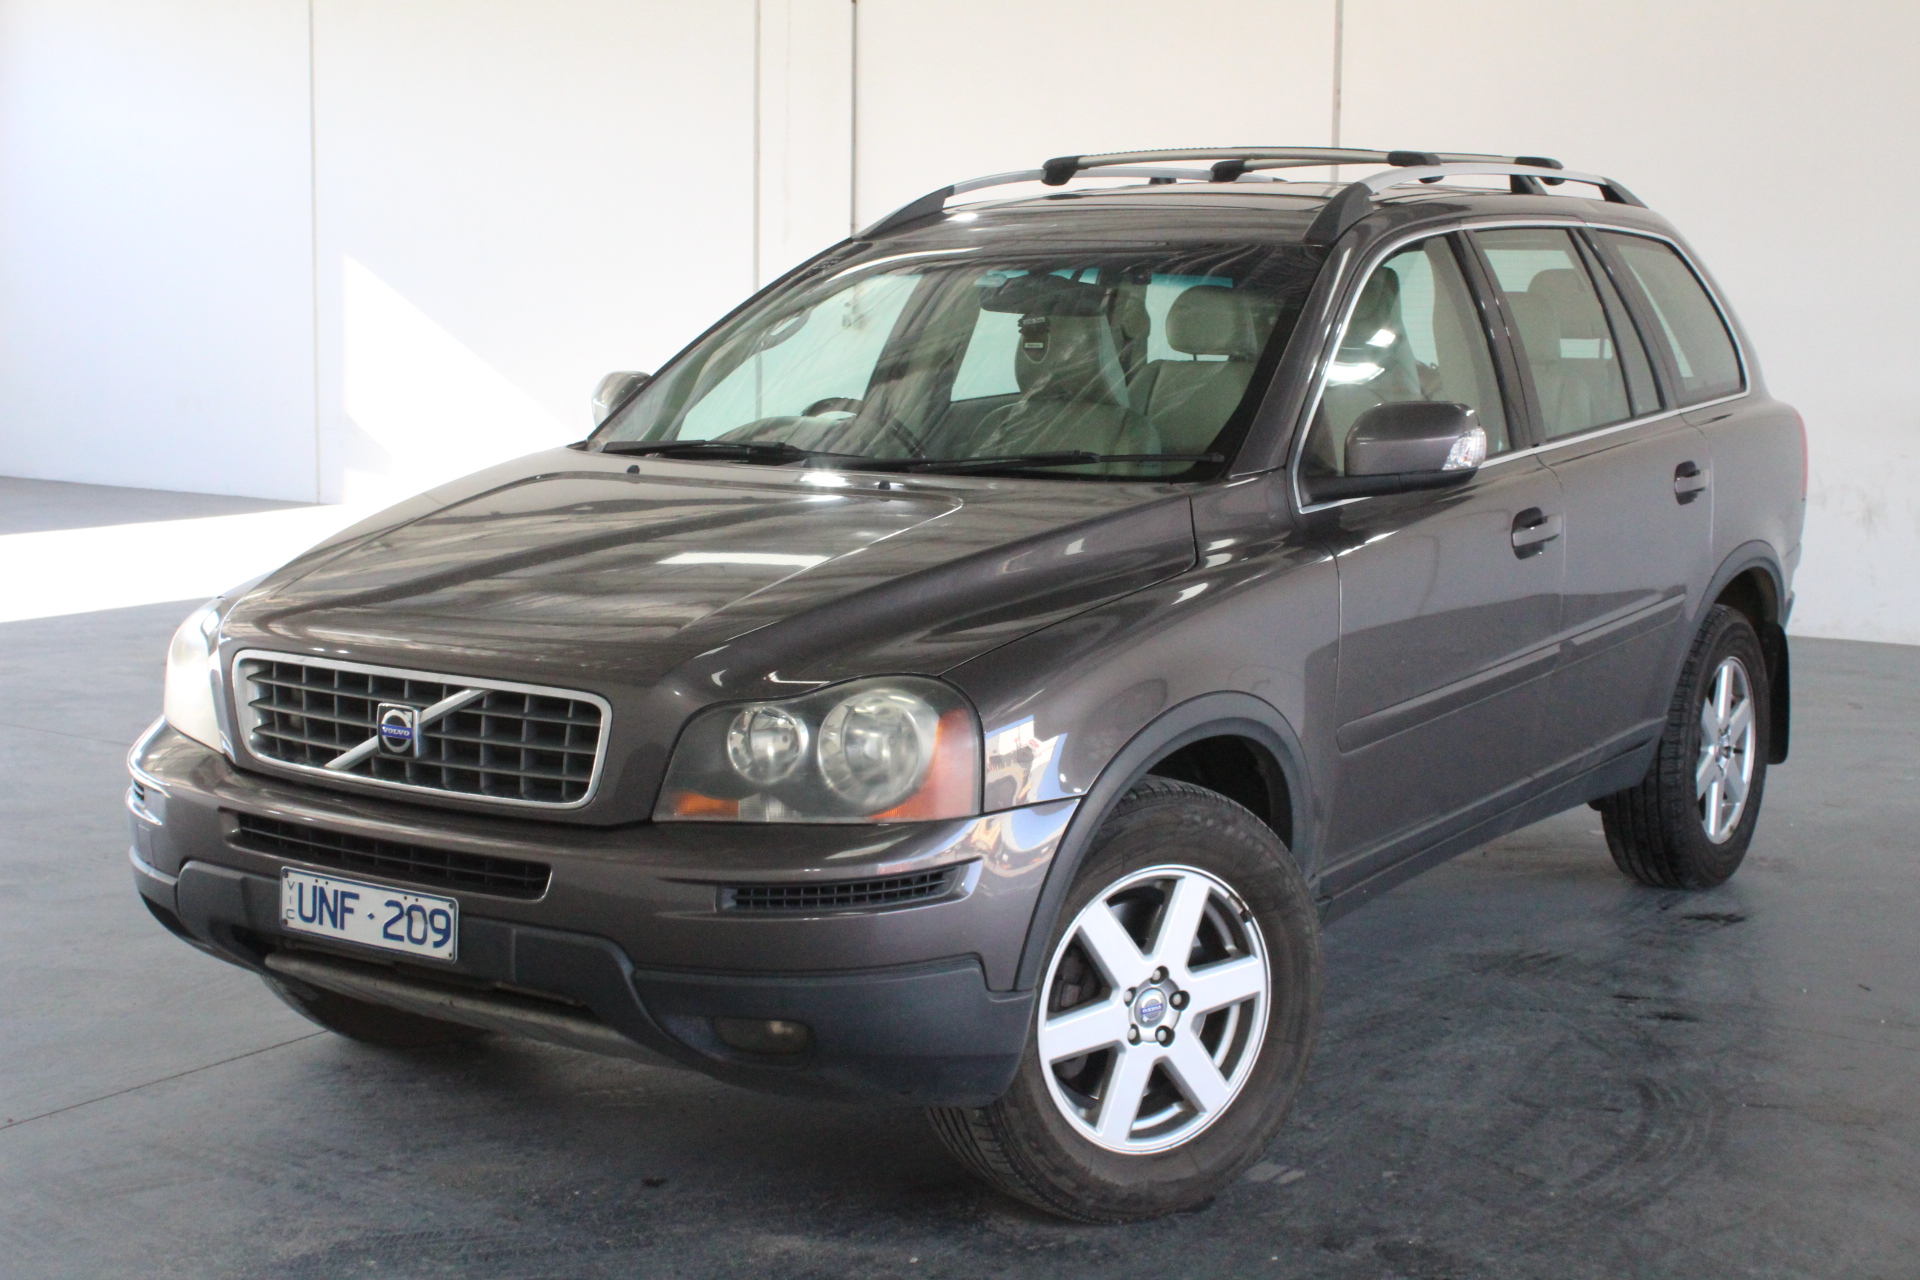 2006 Volvo XC90 D5 Turbo Diesel Automatic 7 Seats Wagon